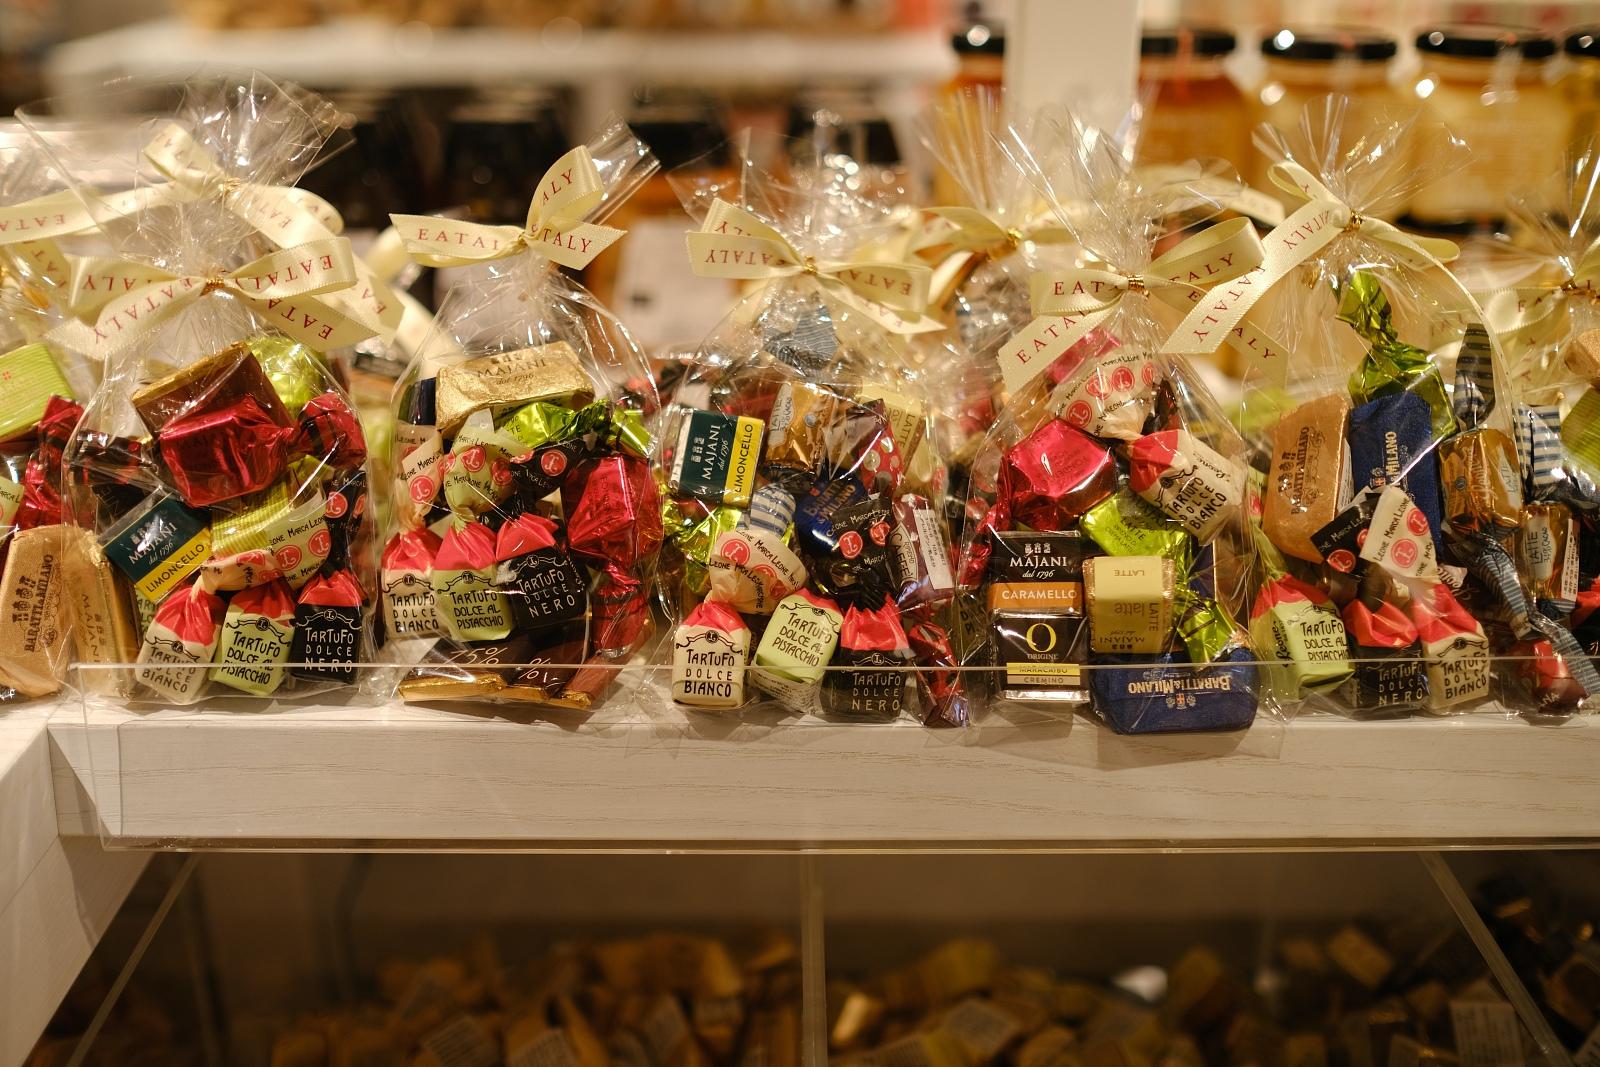 EAT BETTER LIVE BETTER(よい食事は人生をより豊かにする)! イタリアの食文化をまるごと体感できる「イータリー銀座店」オープン